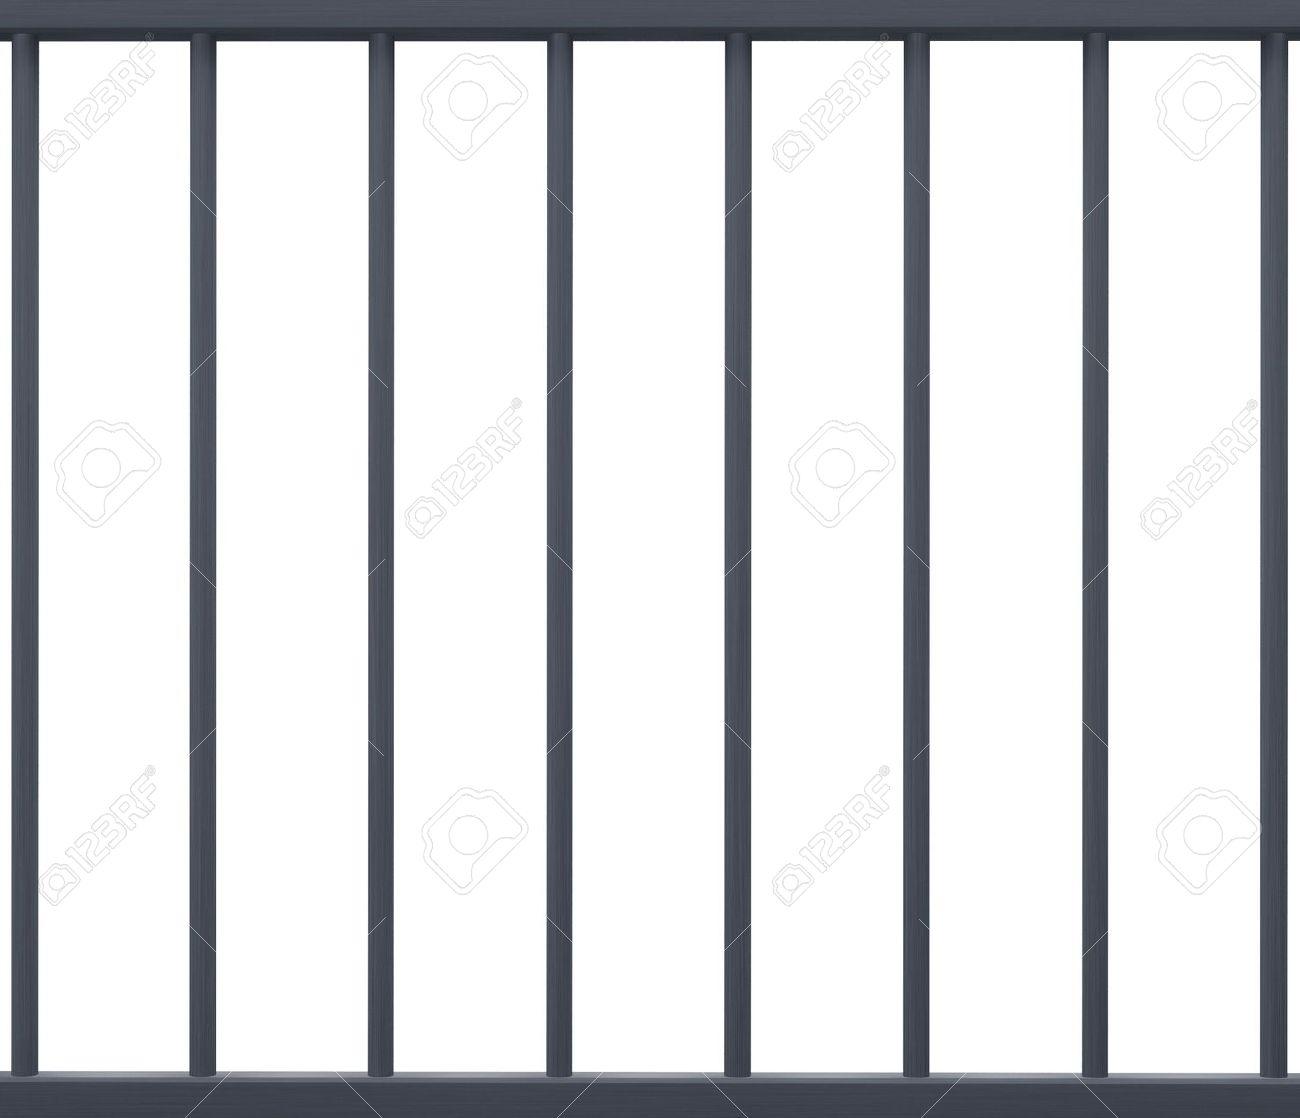 Bar clipart prisoner, Picture #256774 bar clipart prisoner.